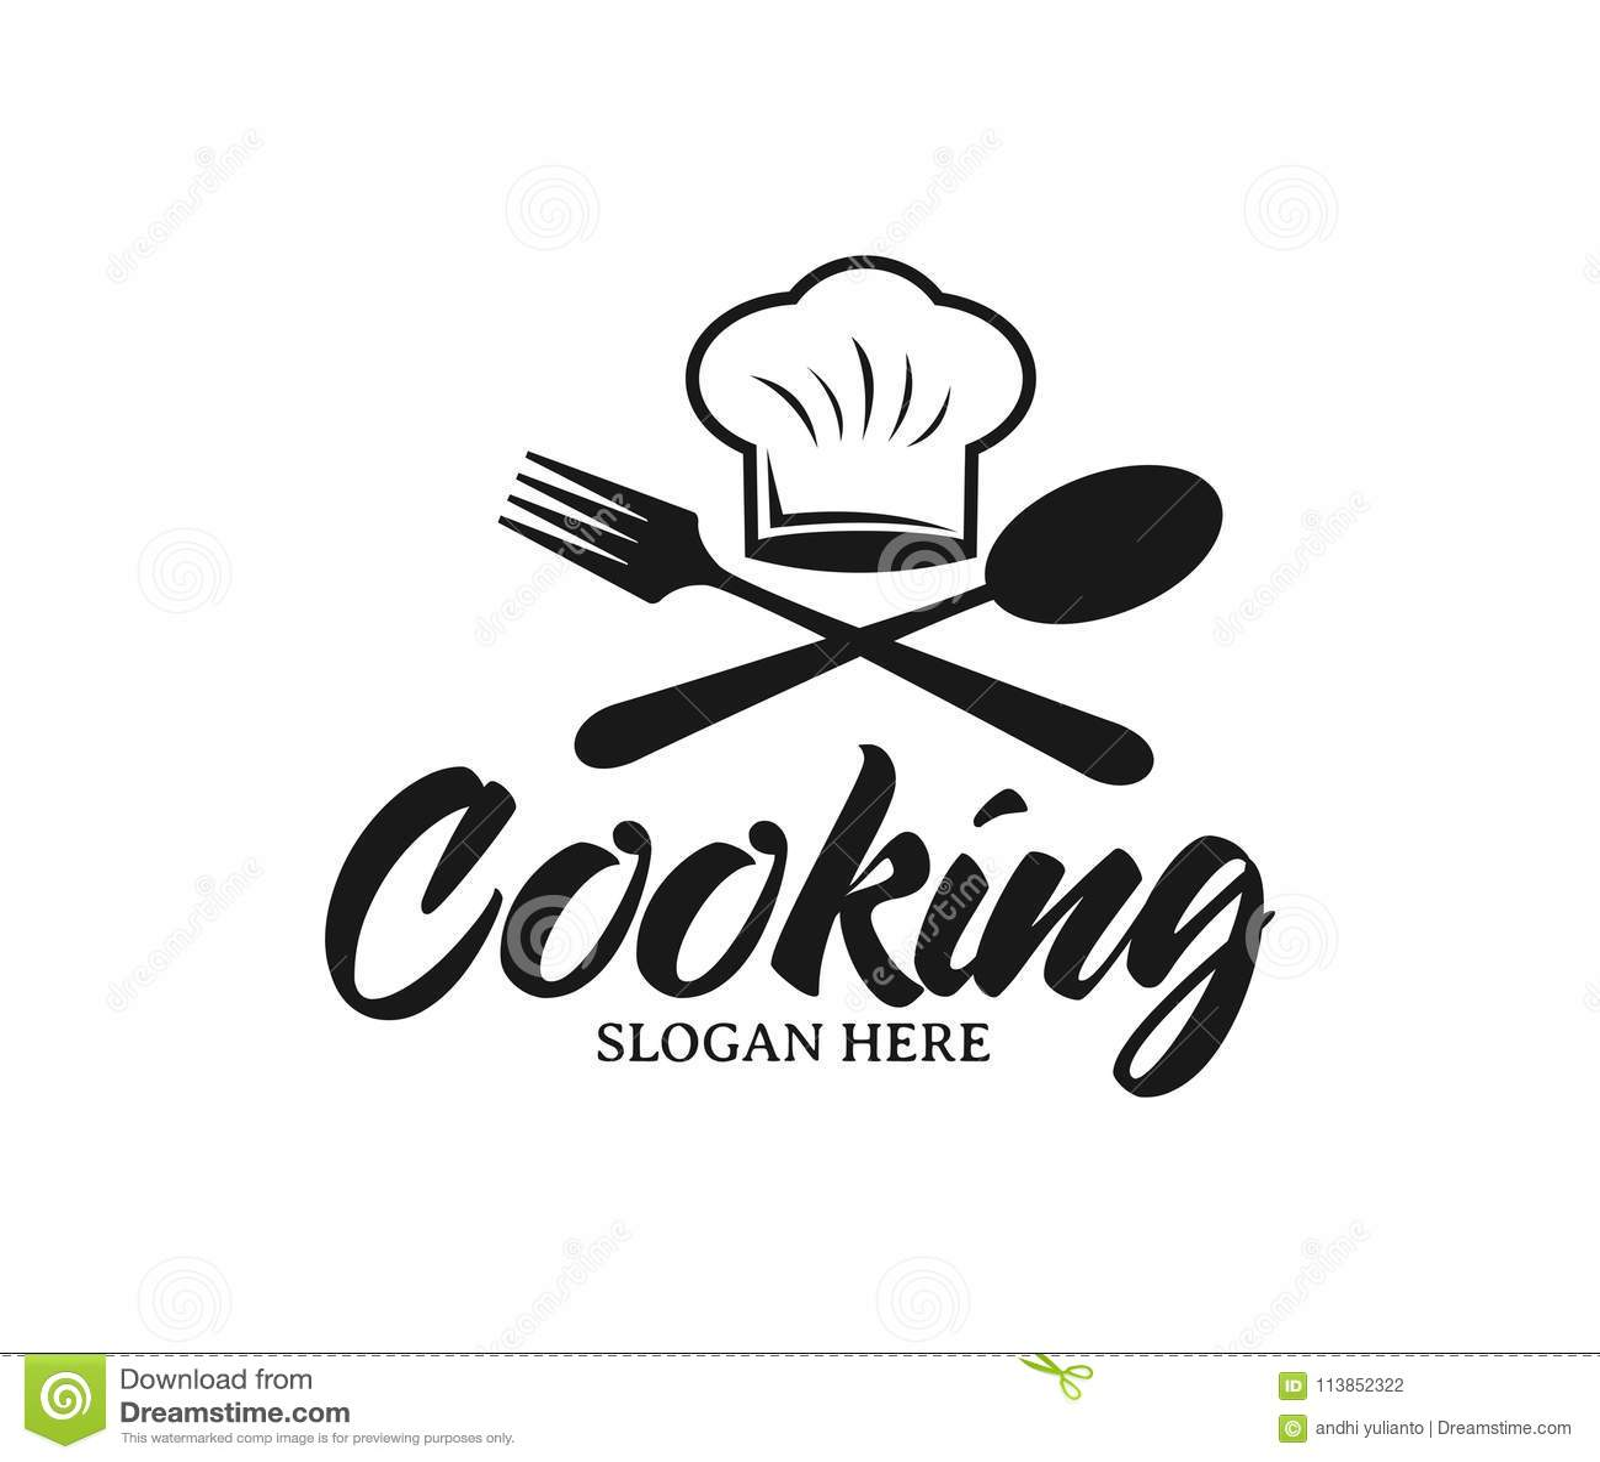 Chef Mickey S Buffet